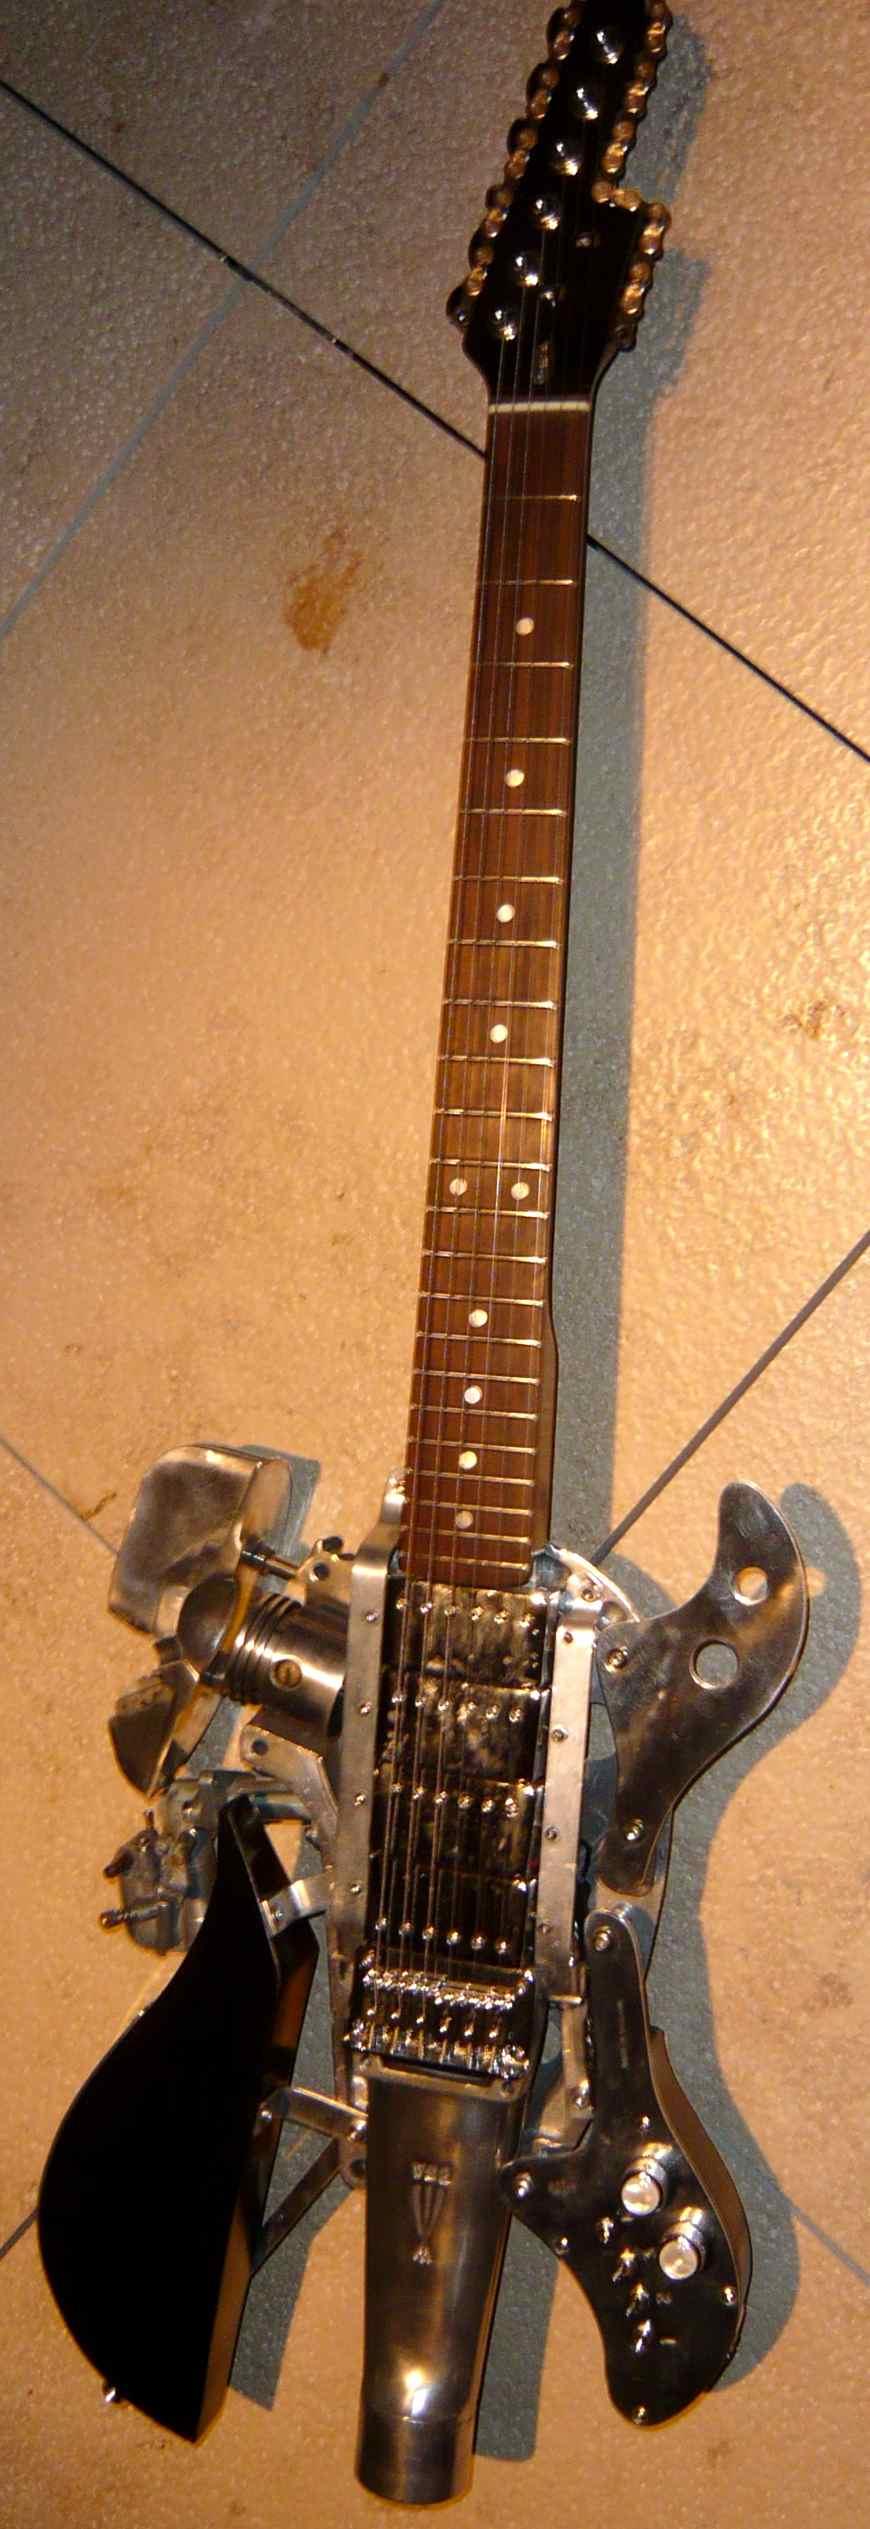 british custom guitars bsa guitar 2008 tune your sound. Black Bedroom Furniture Sets. Home Design Ideas